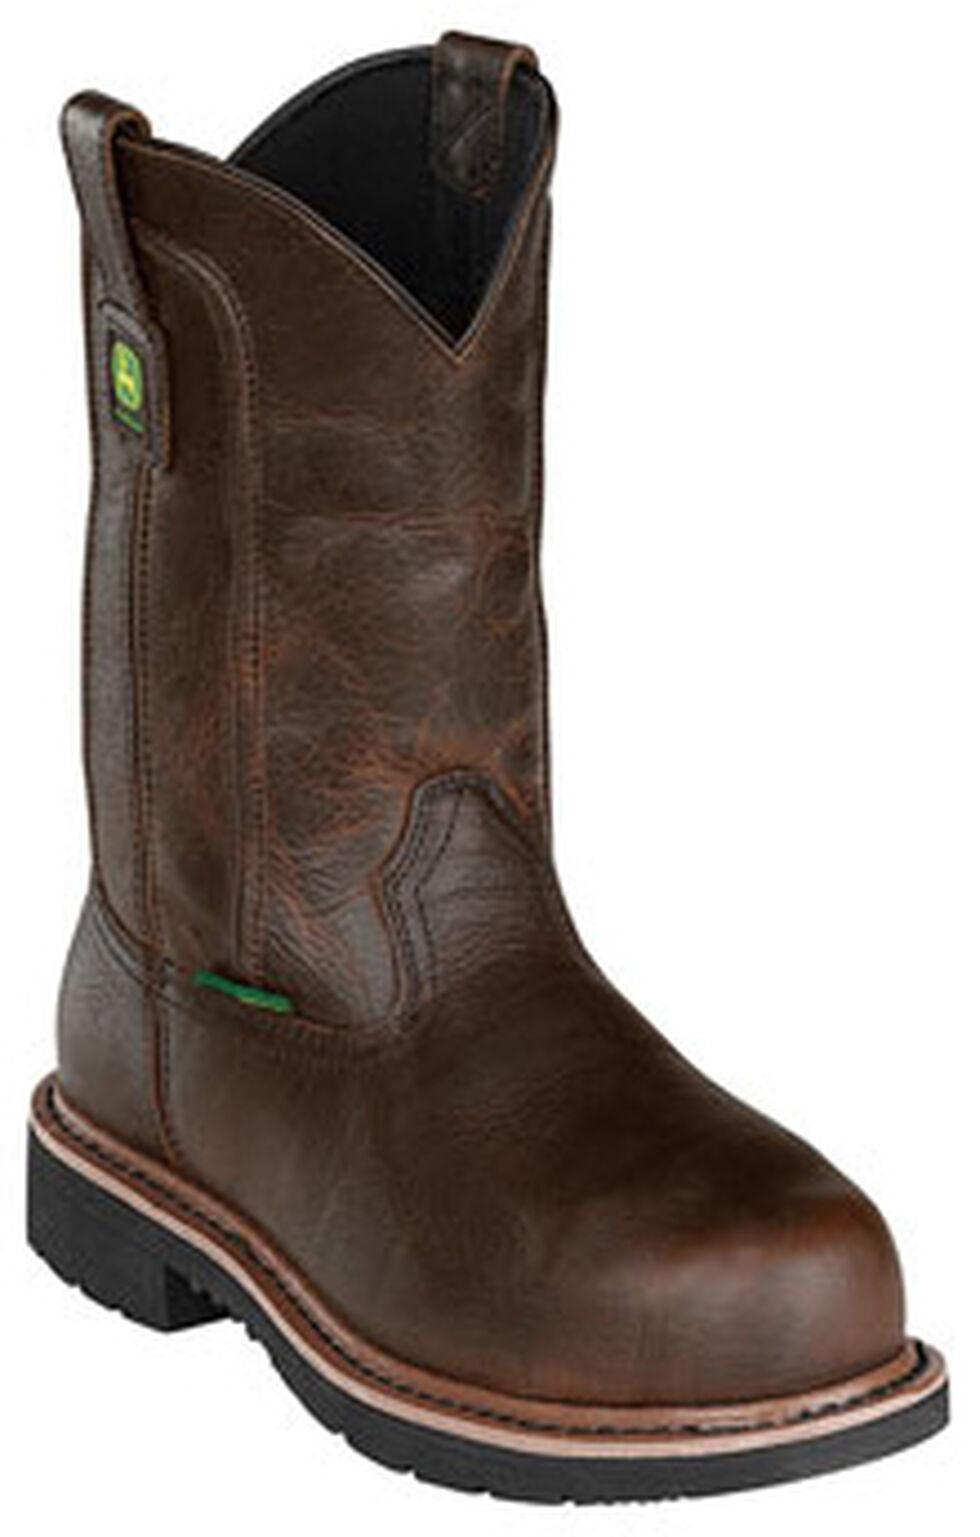 John Deere Men's Leather Pull-On Work Boots - Steel Toe, Dark Brown, hi-res